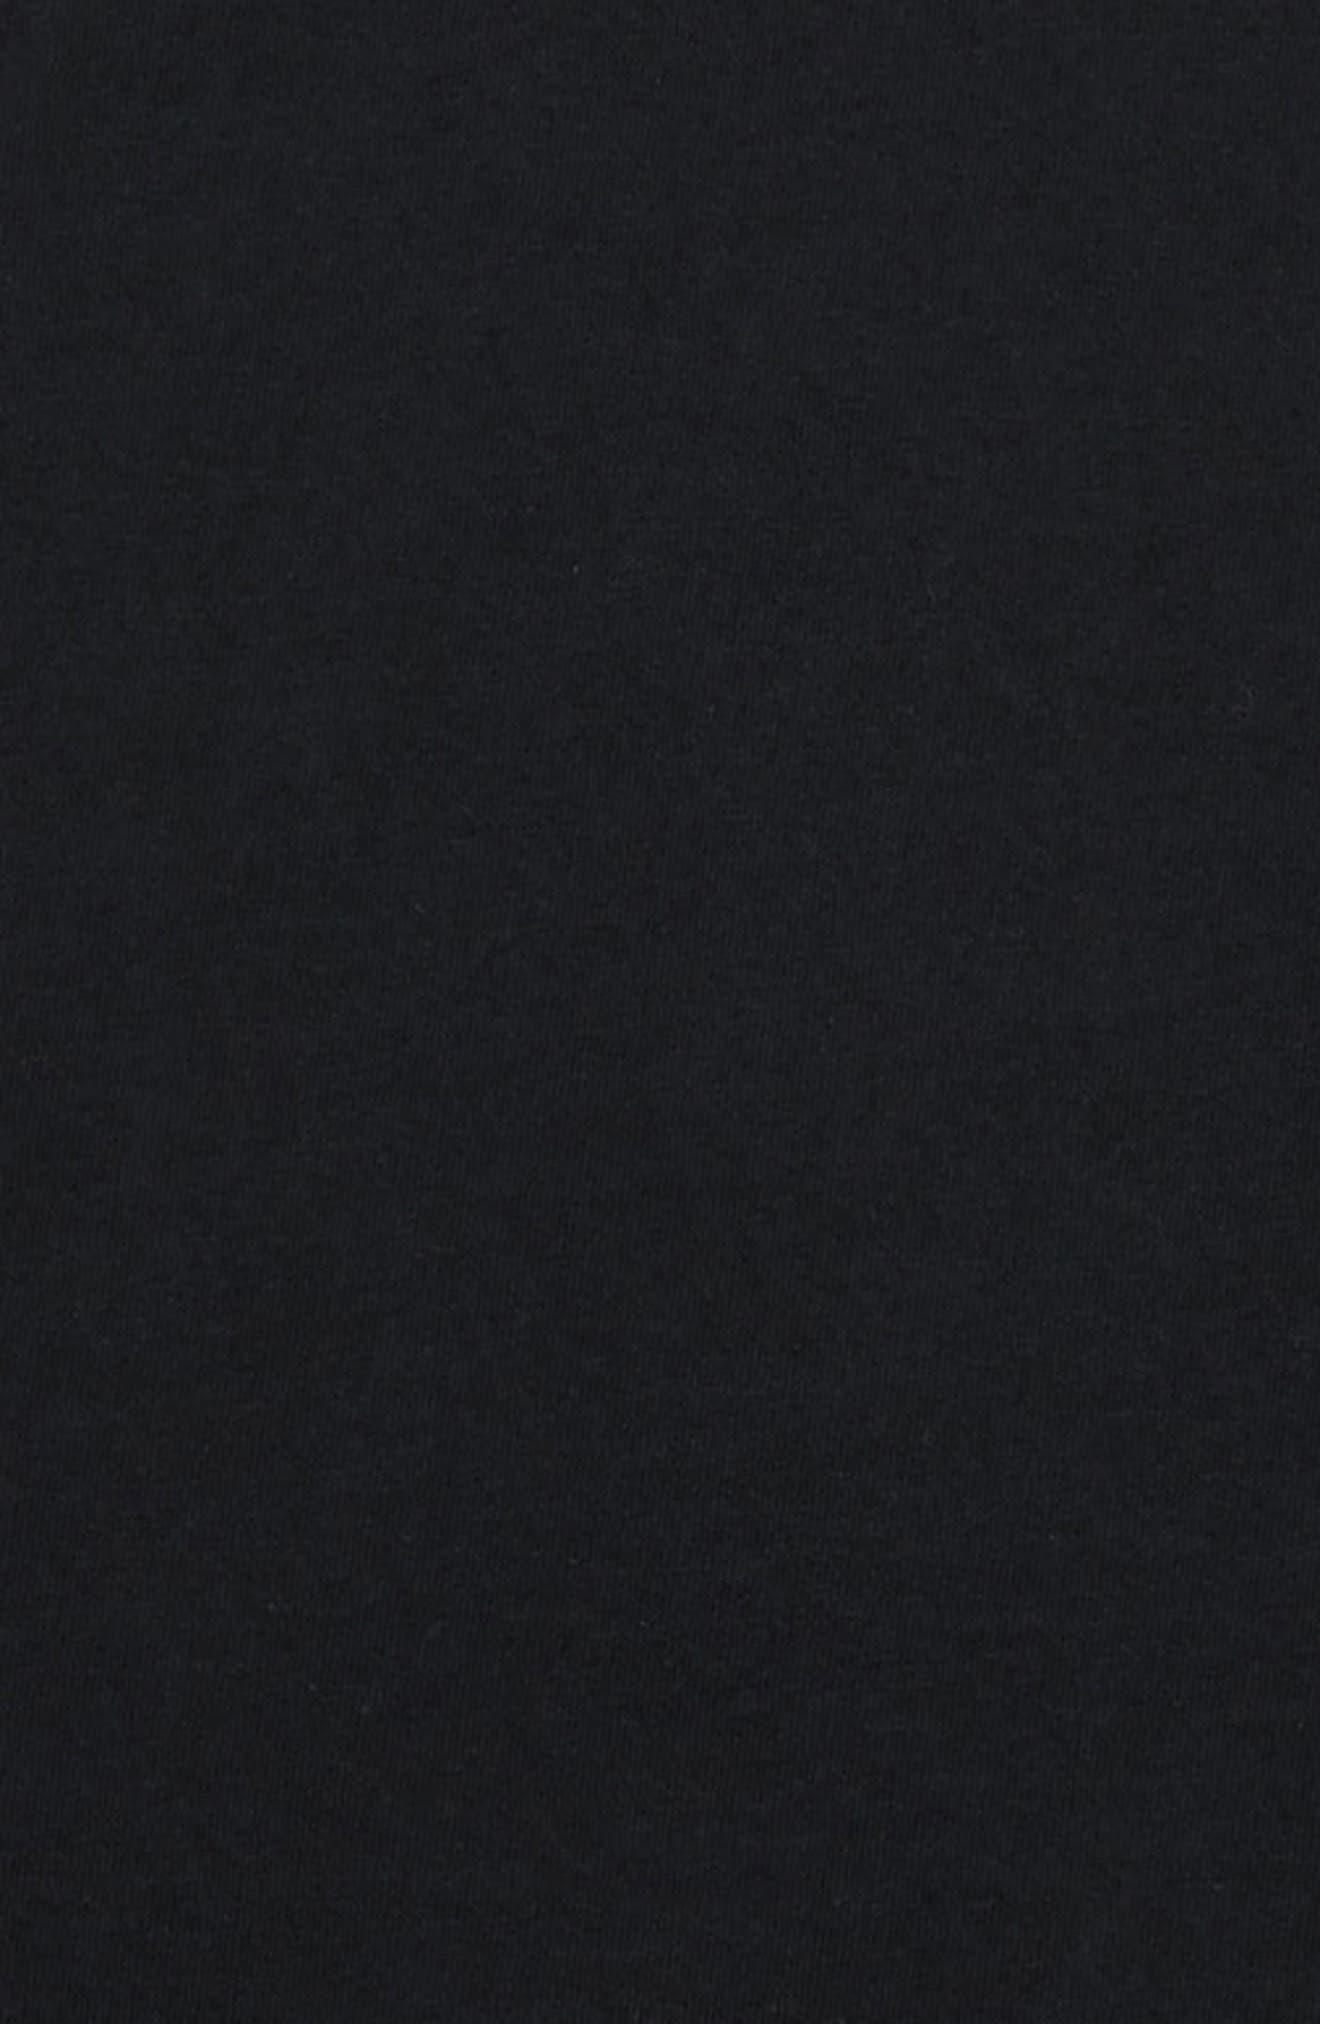 Wrecker Raglan Sleeve T-Shirt,                             Alternate thumbnail 2, color,                             001